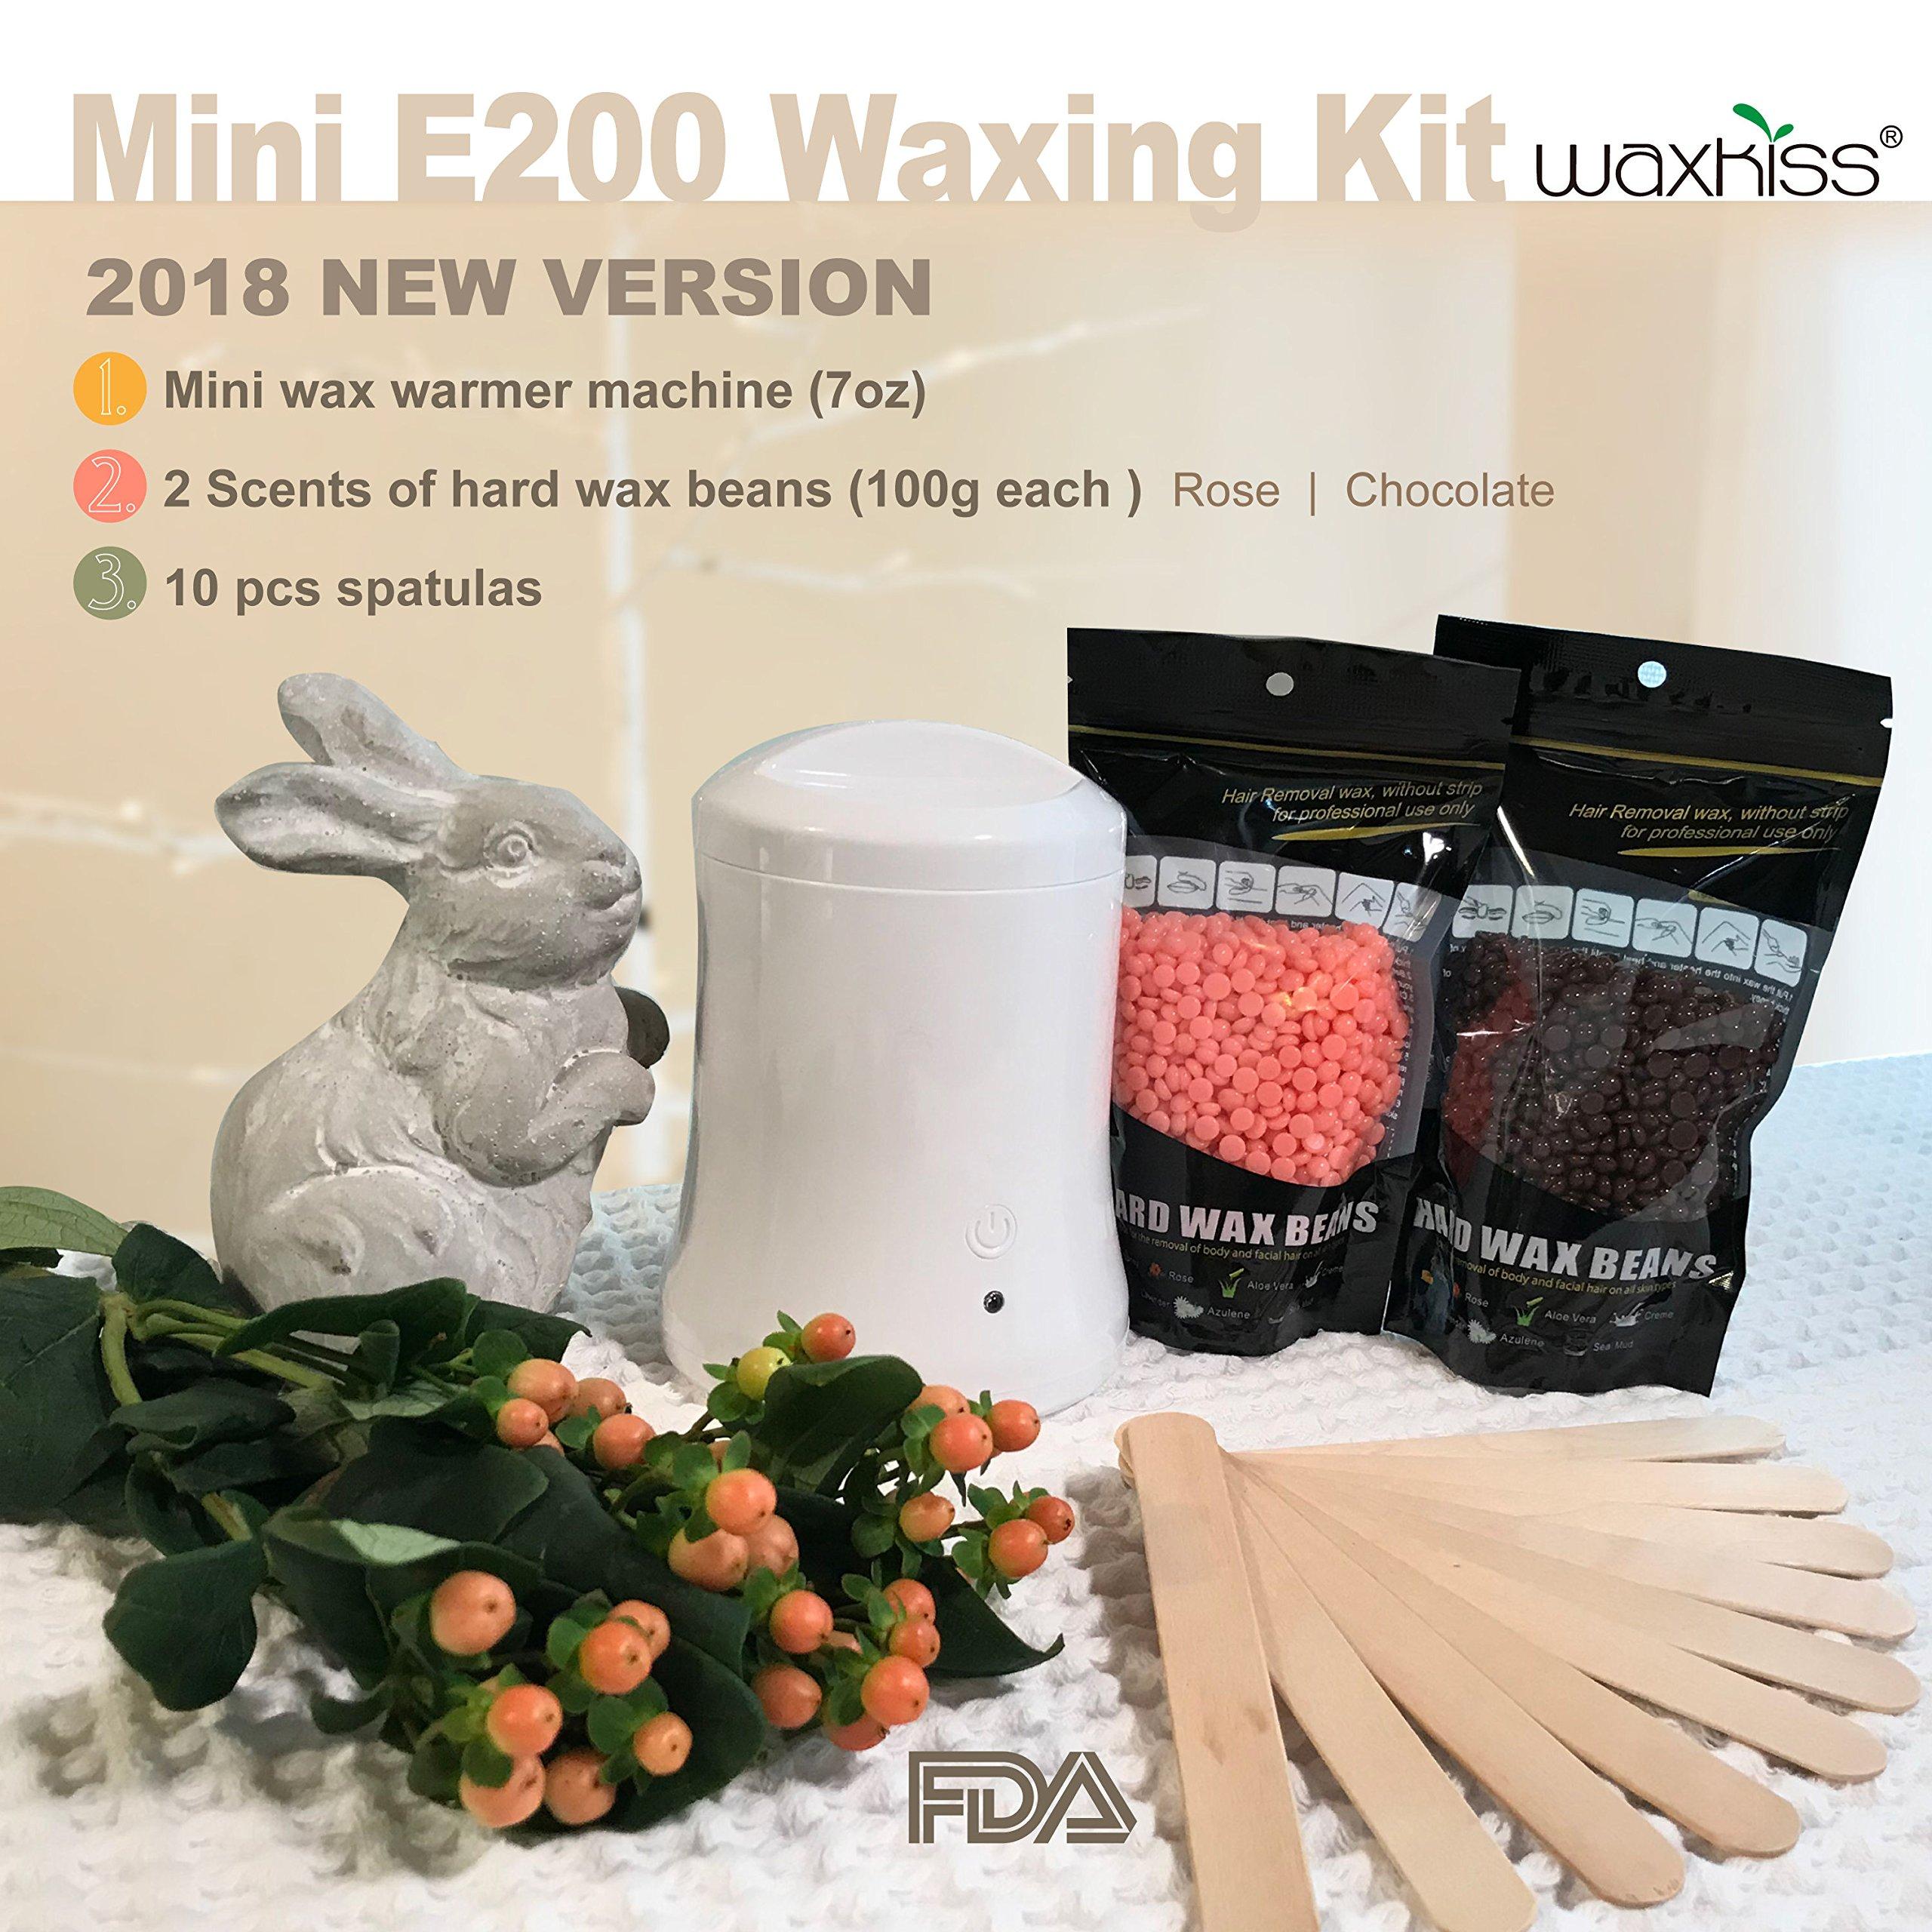 [ 2018 Upgrade Version ] Waxkiss Mini Wax Warmer Kit 7oz Hair Removal Wax Heater Kit One Key Control with Hard Wax Beans for Woman & Man Wax Kit (1 Wax Warmer & 2 Bags Wax Beans & 10 Wooden Sticks)